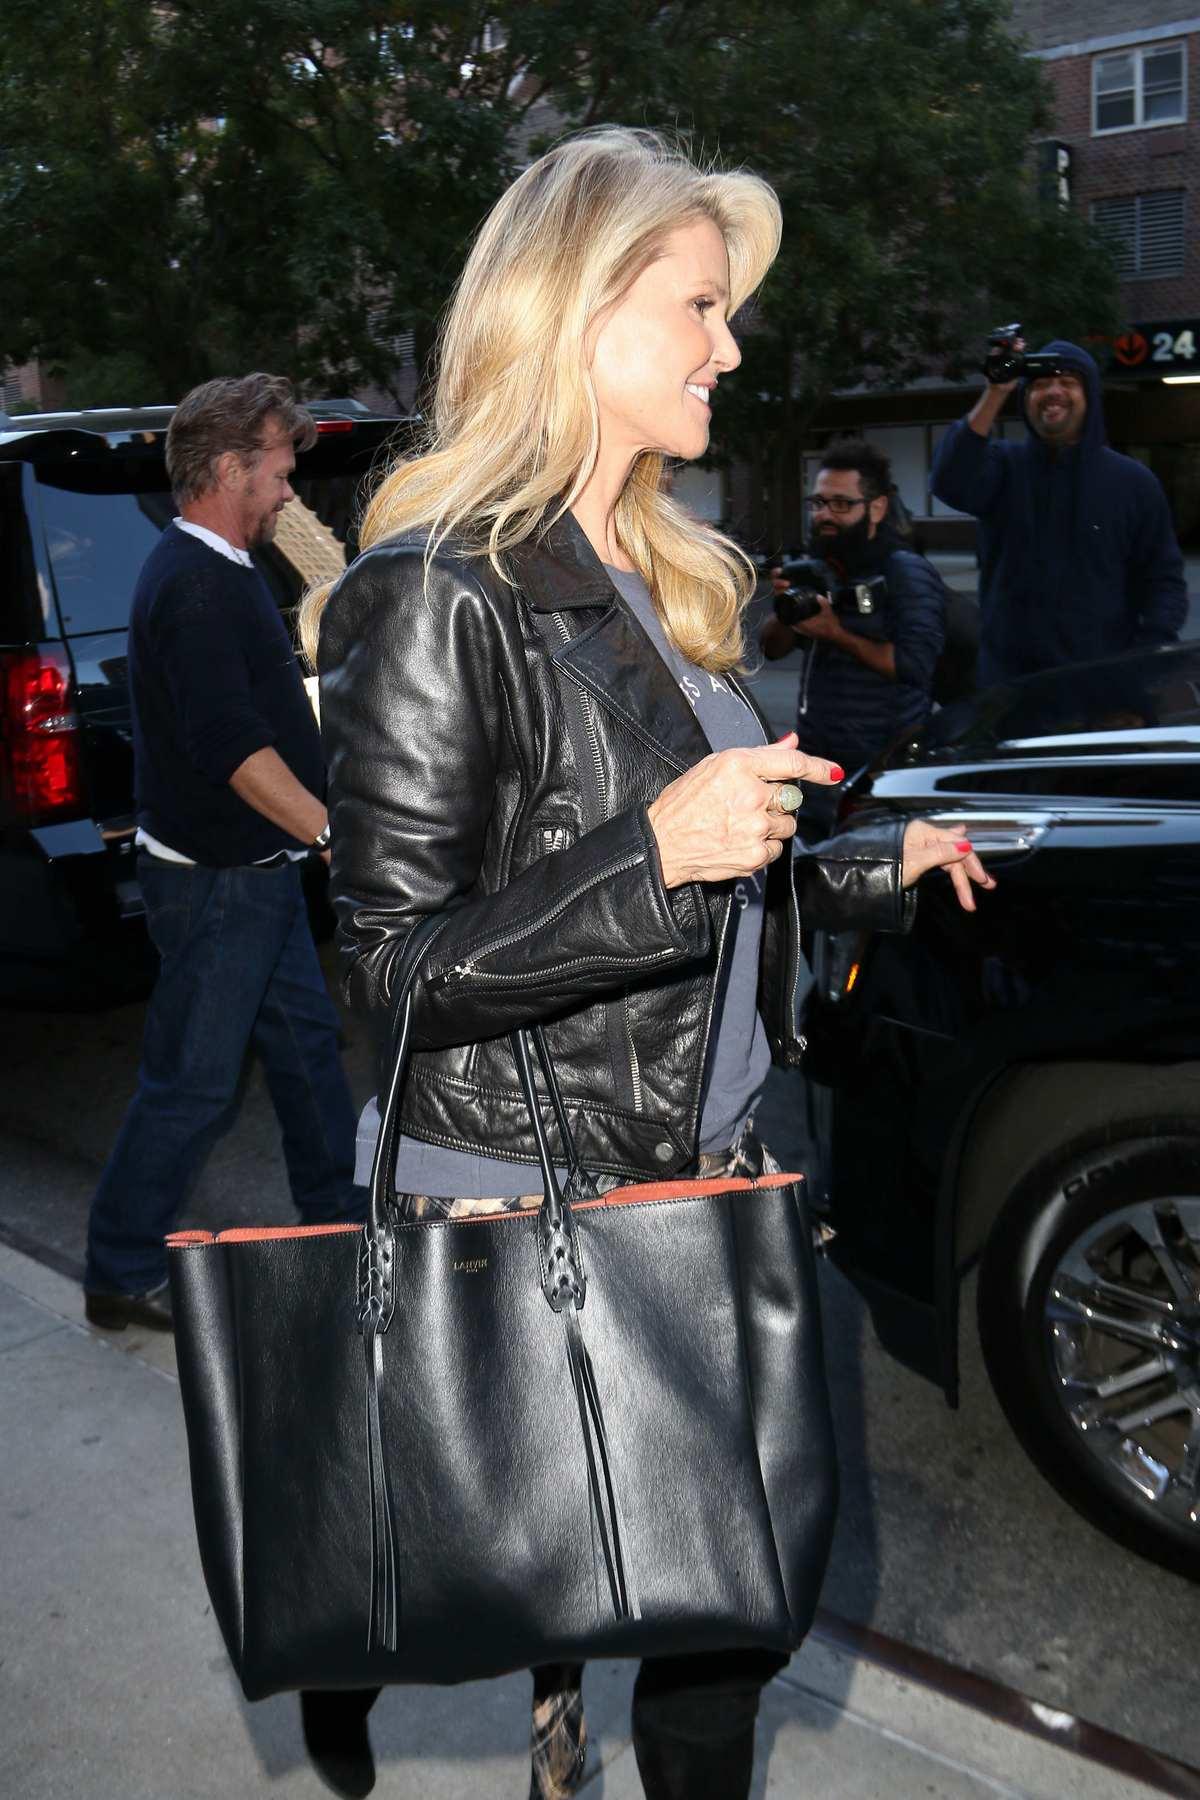 Christie Brinkley and John Mellencamp Leaving Greenwich Hotel-2